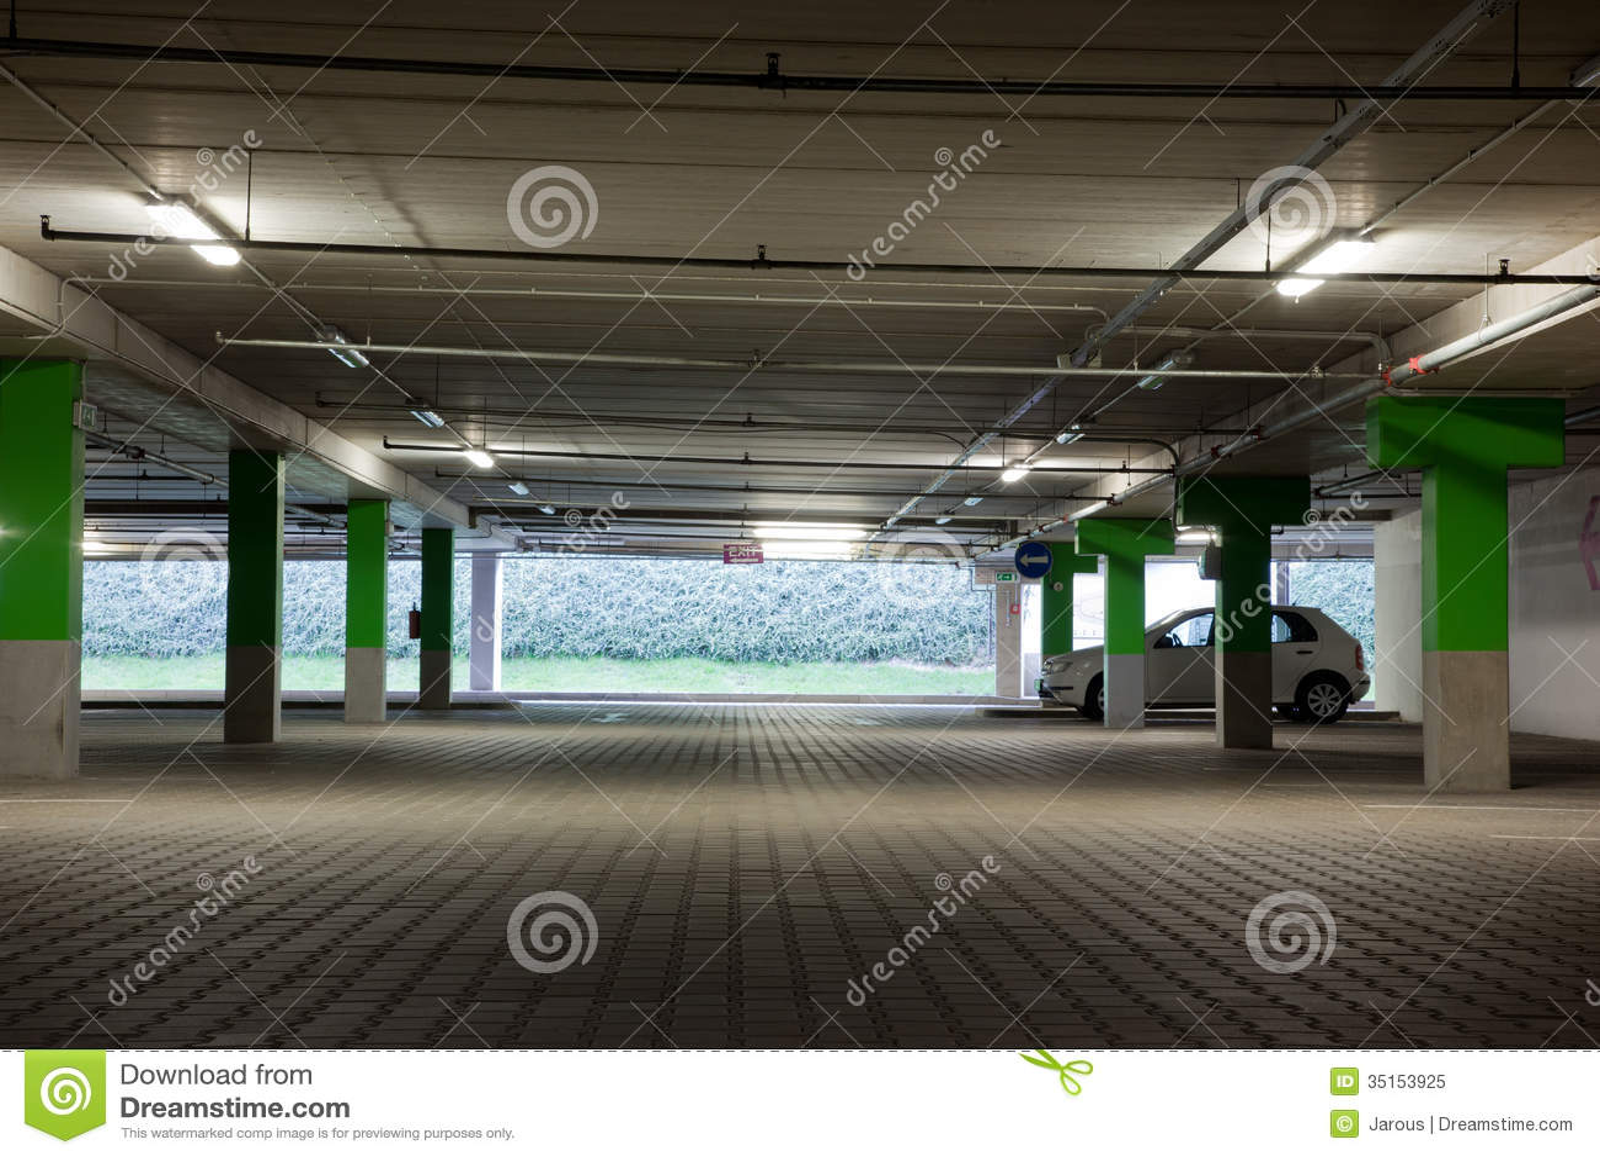 Parking Lot Stock Image Image Of Building Autocar Drive